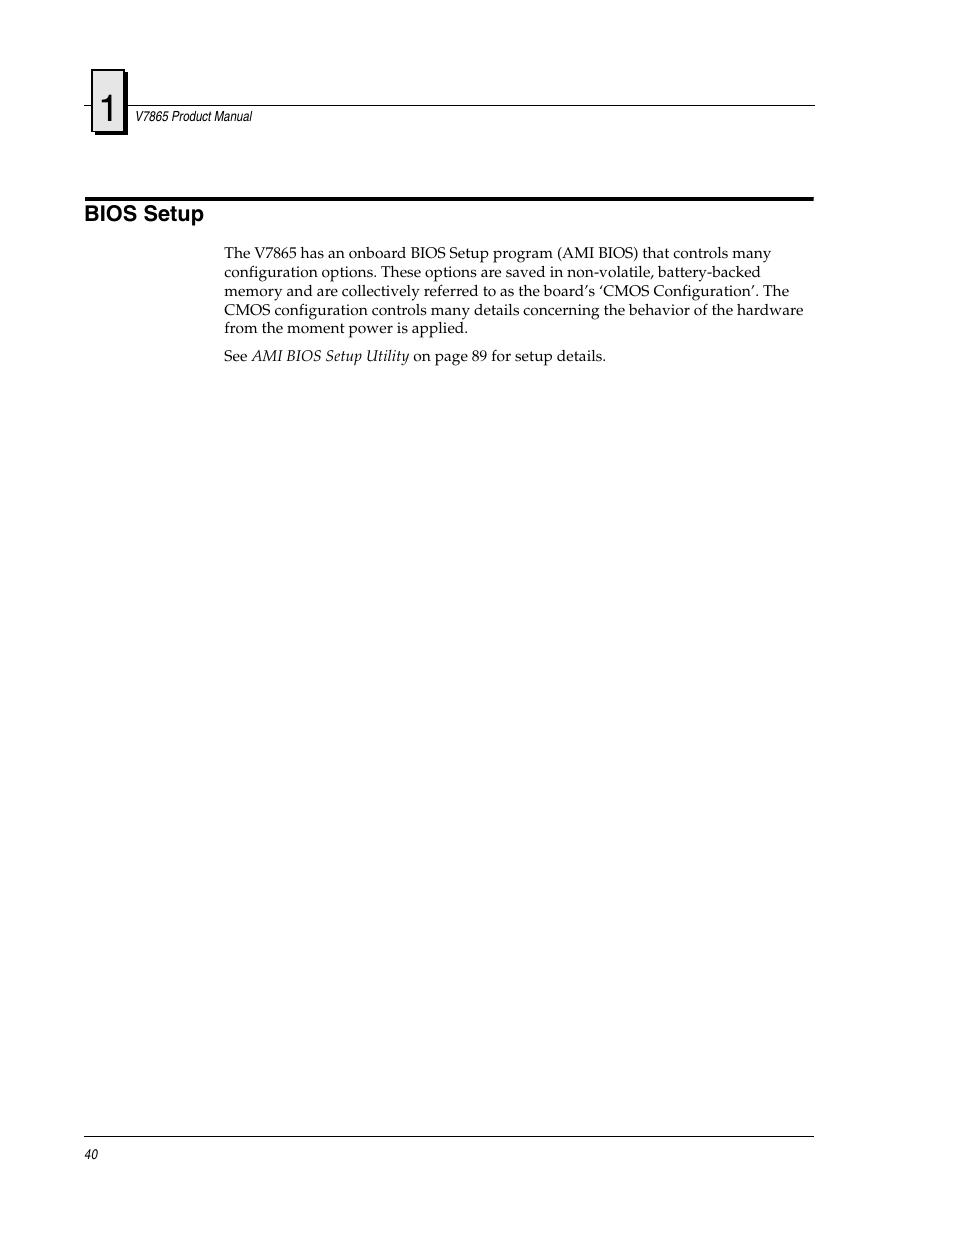 Bios setup | FANUC Robotics America V7865* User Manual | Page 40 / 103